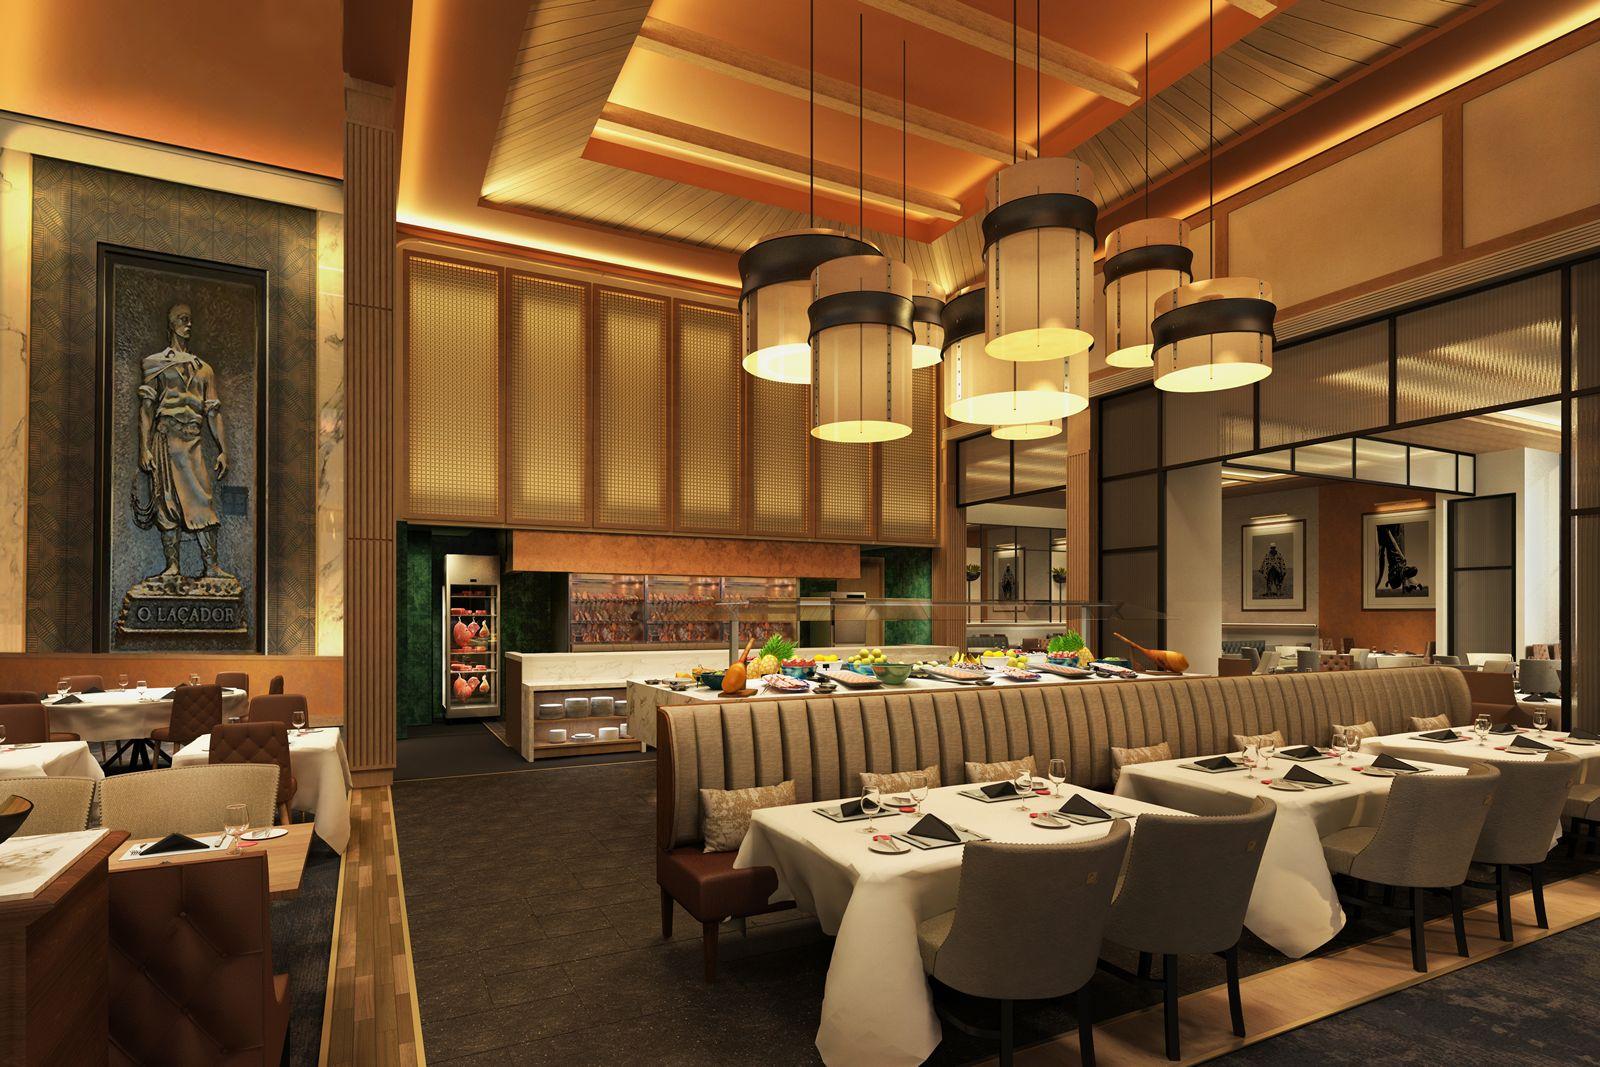 Fogo de Chão Utilizes Harrison's Expertise to Showcase Enhanced Design in Oak Brook Restaurant